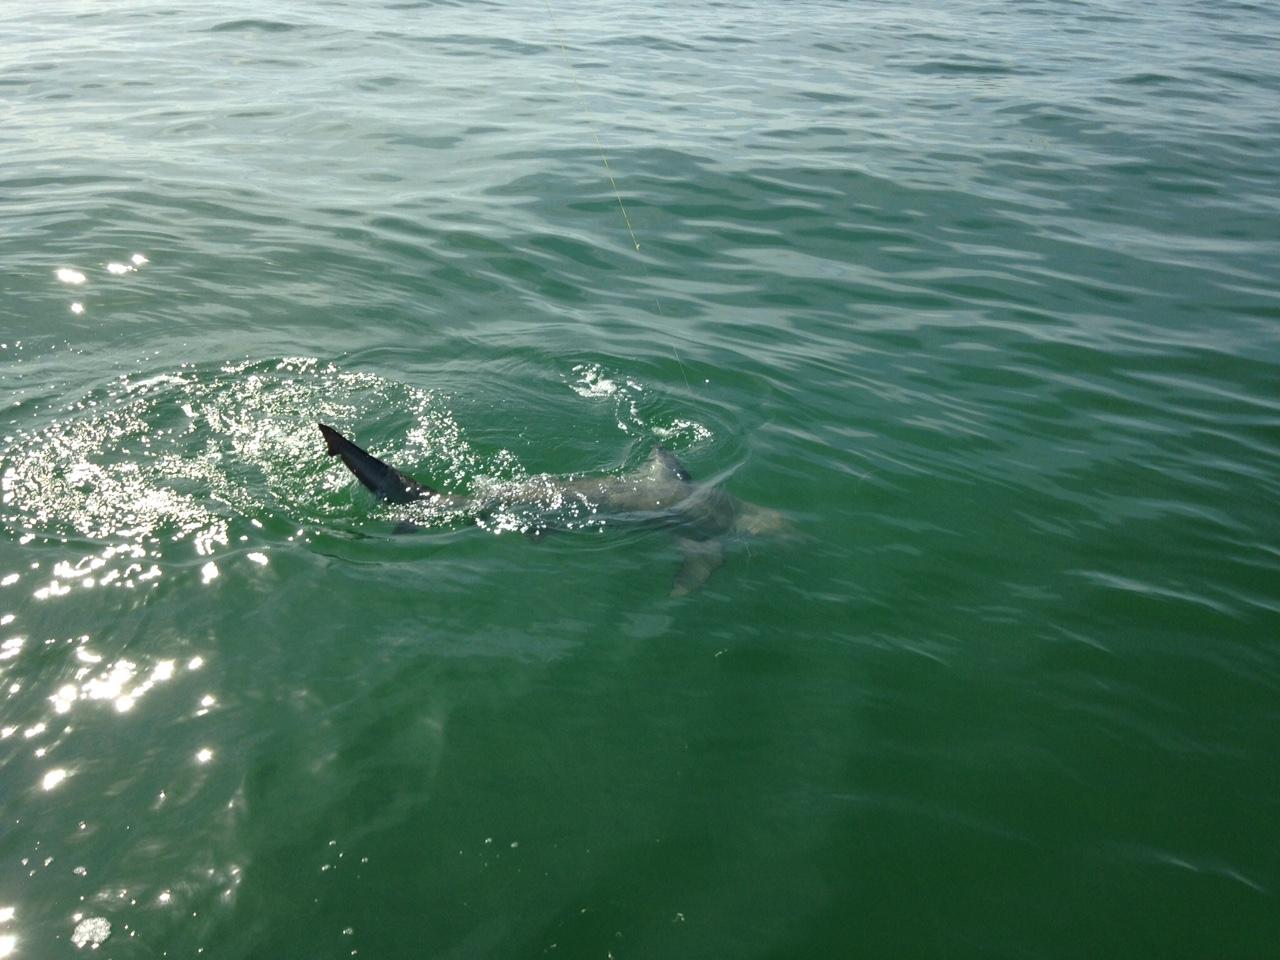 Fishing charters marathon fl keys captain doug kelley for Florida keys fishing charters